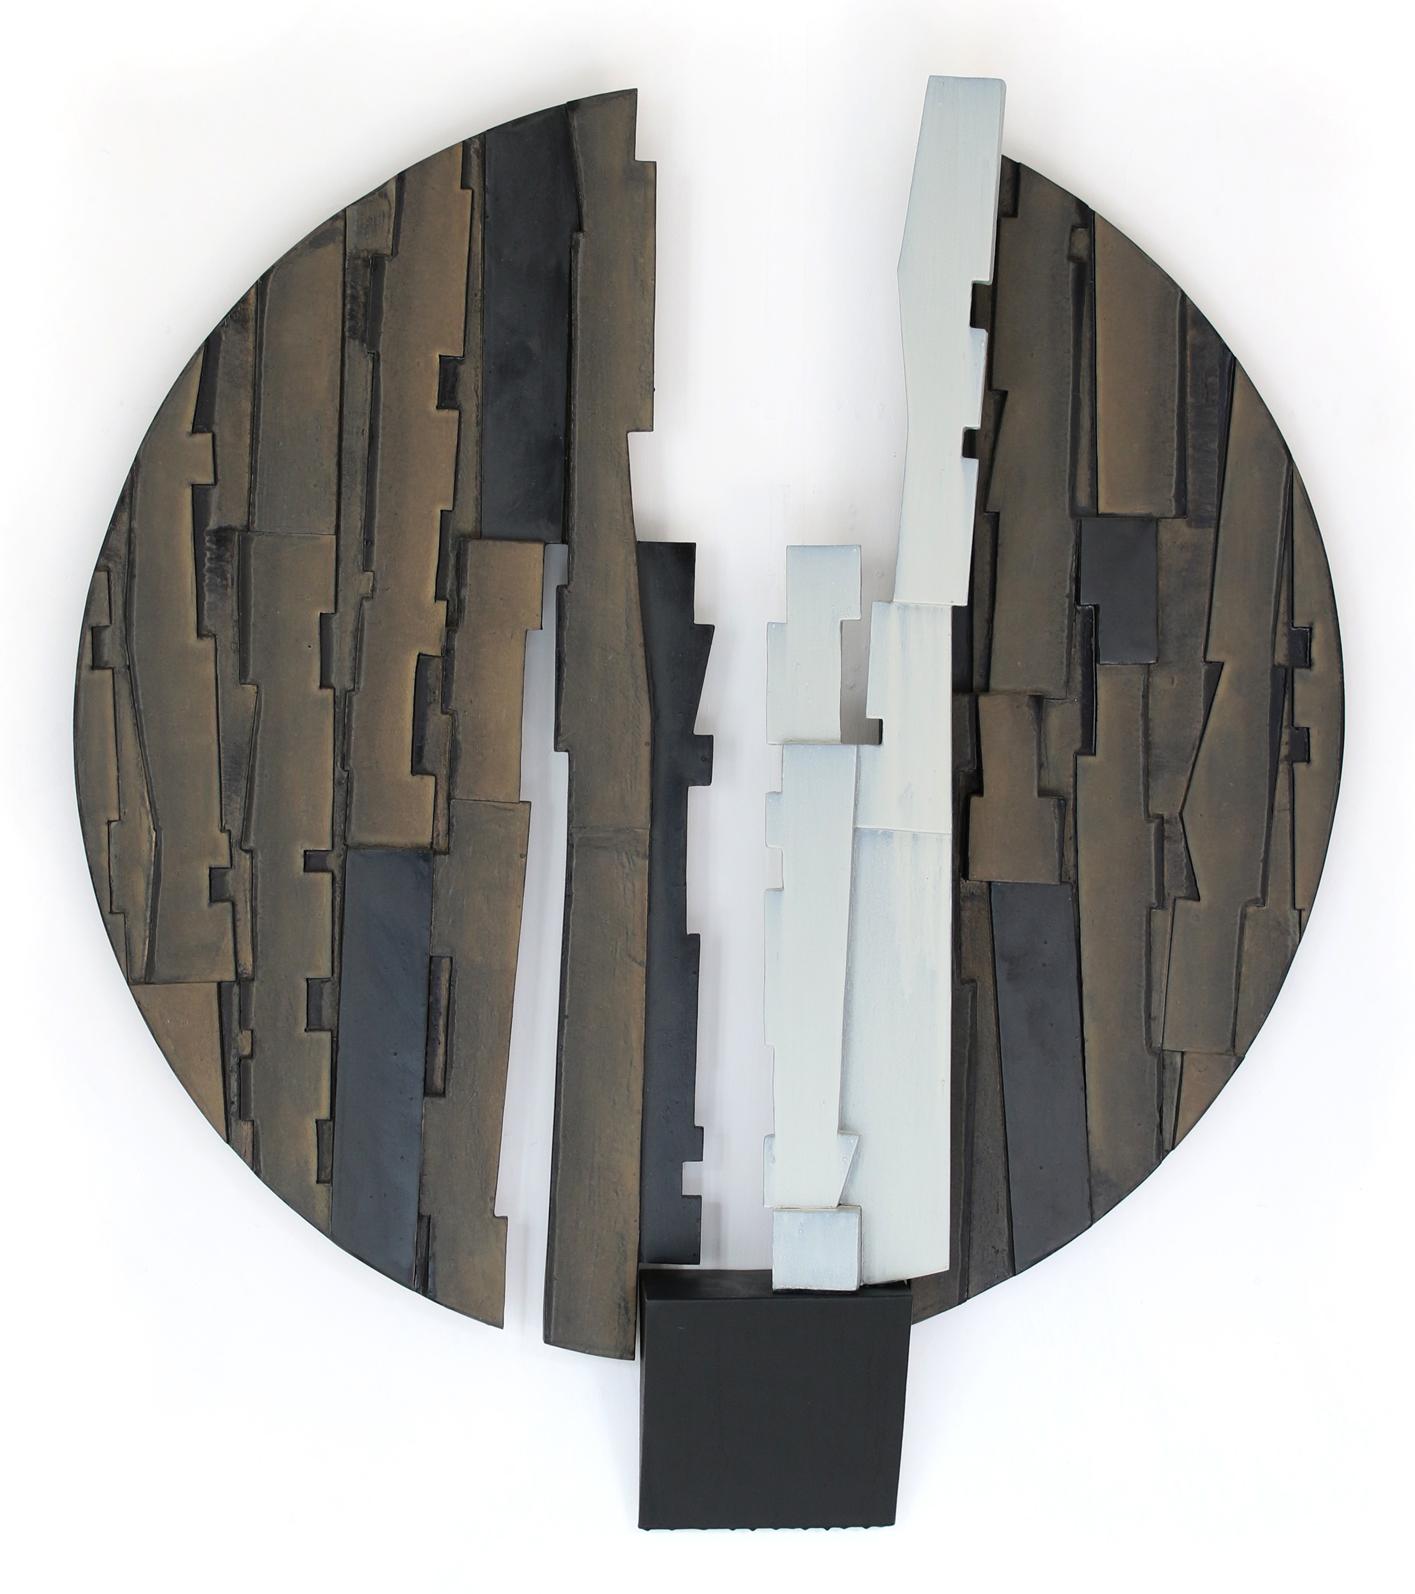 Art Atrium Tony Twigg The beginning